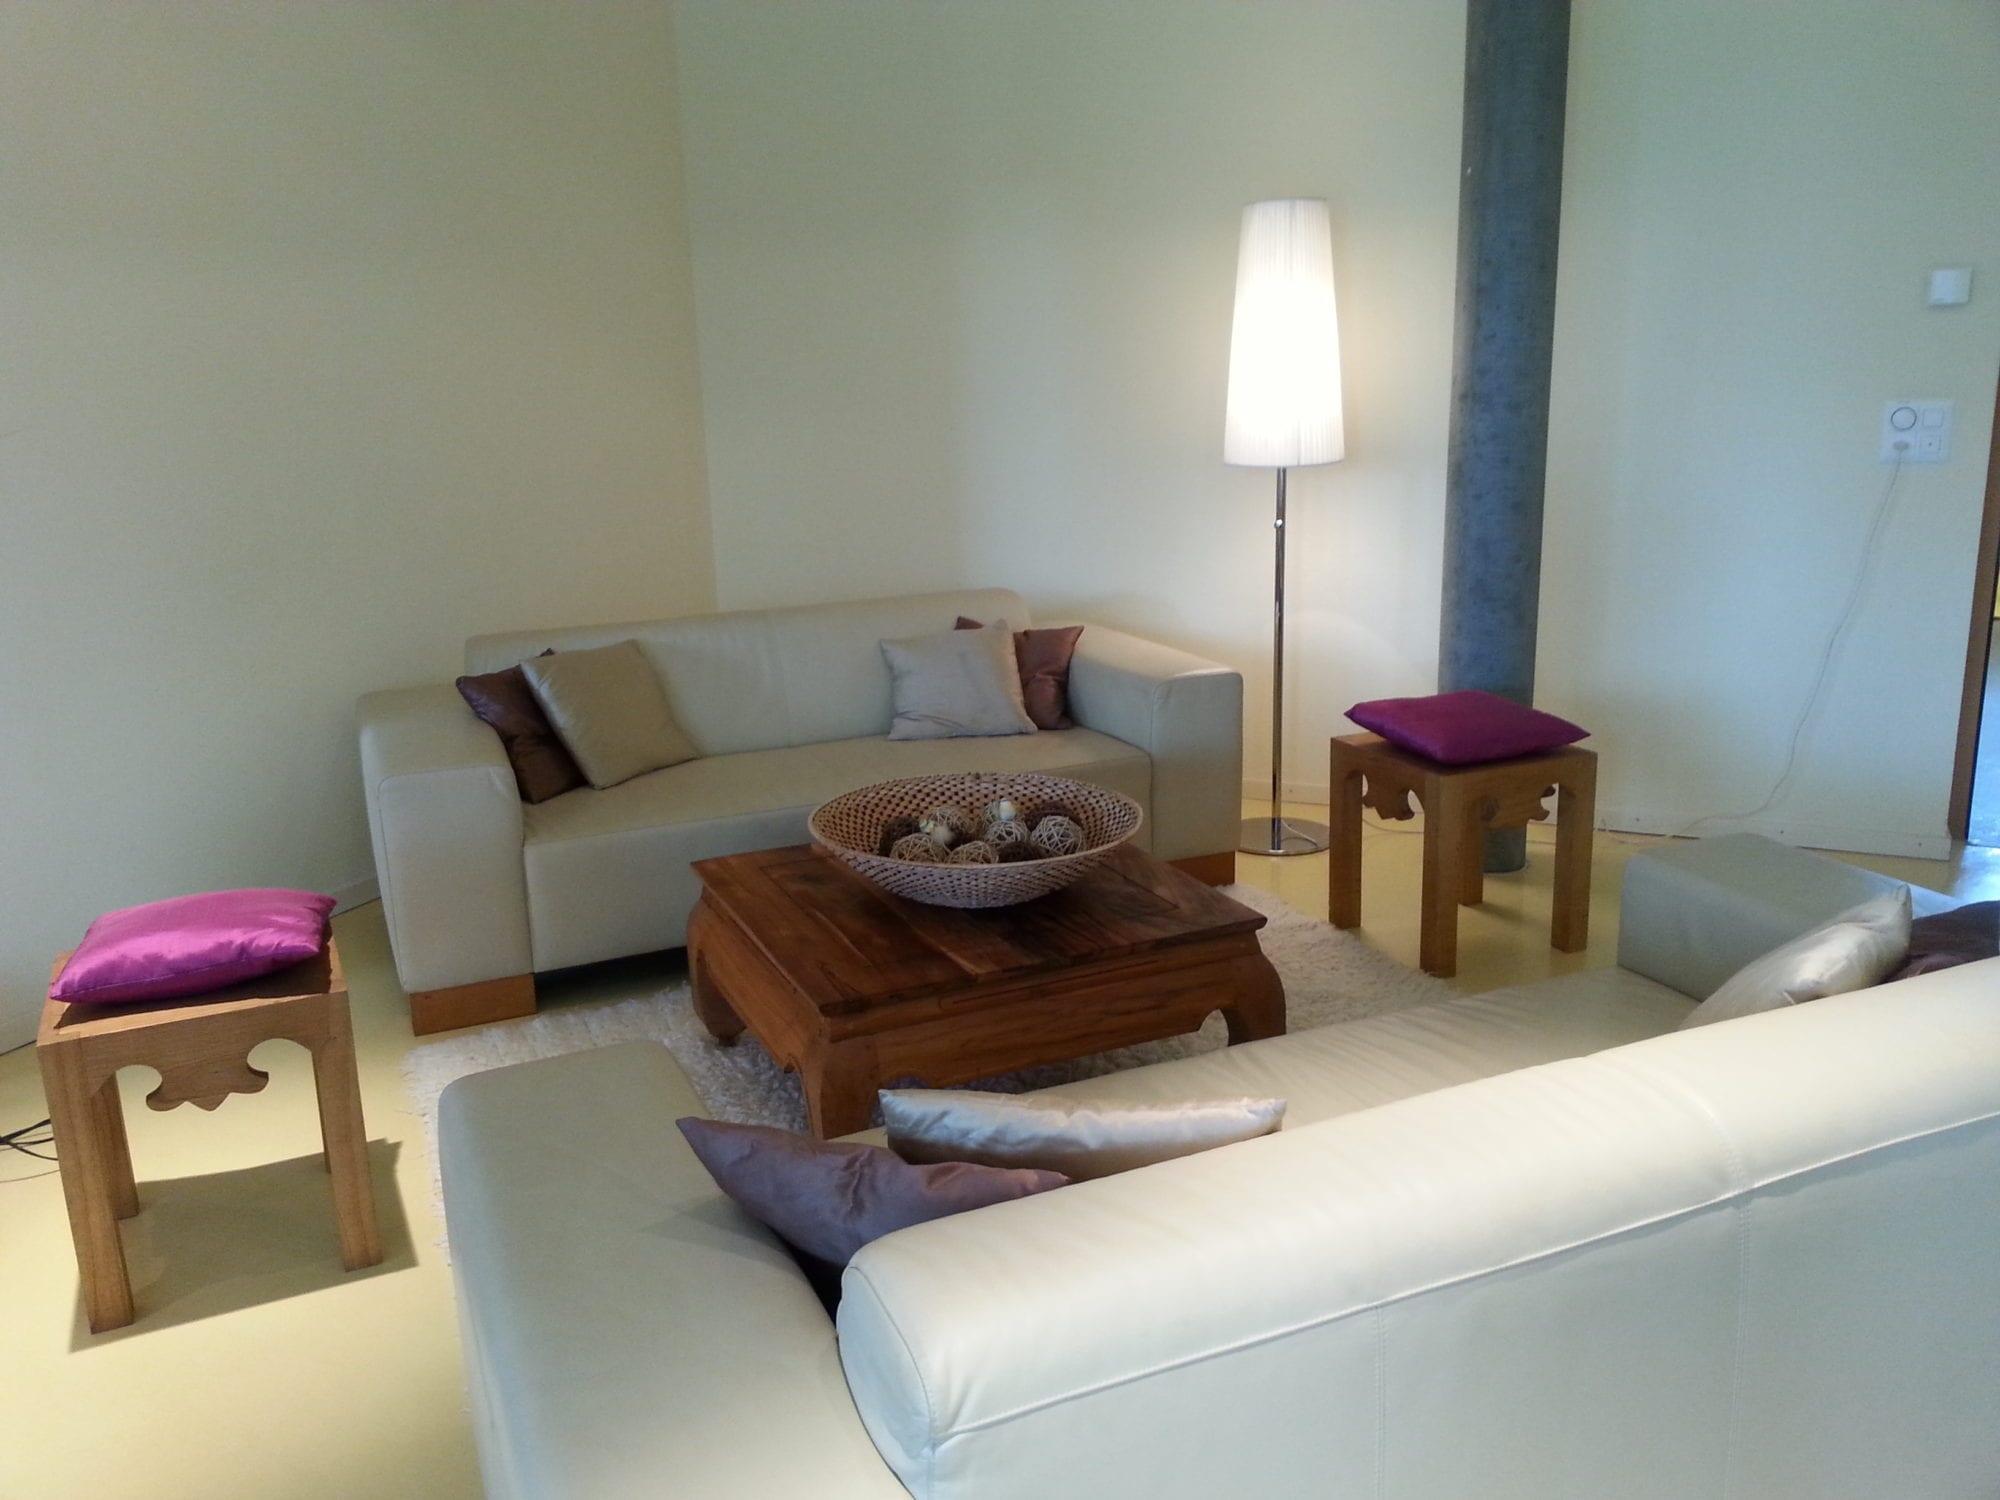 chic lounge - 20 Pax mieten rent-a-lounge